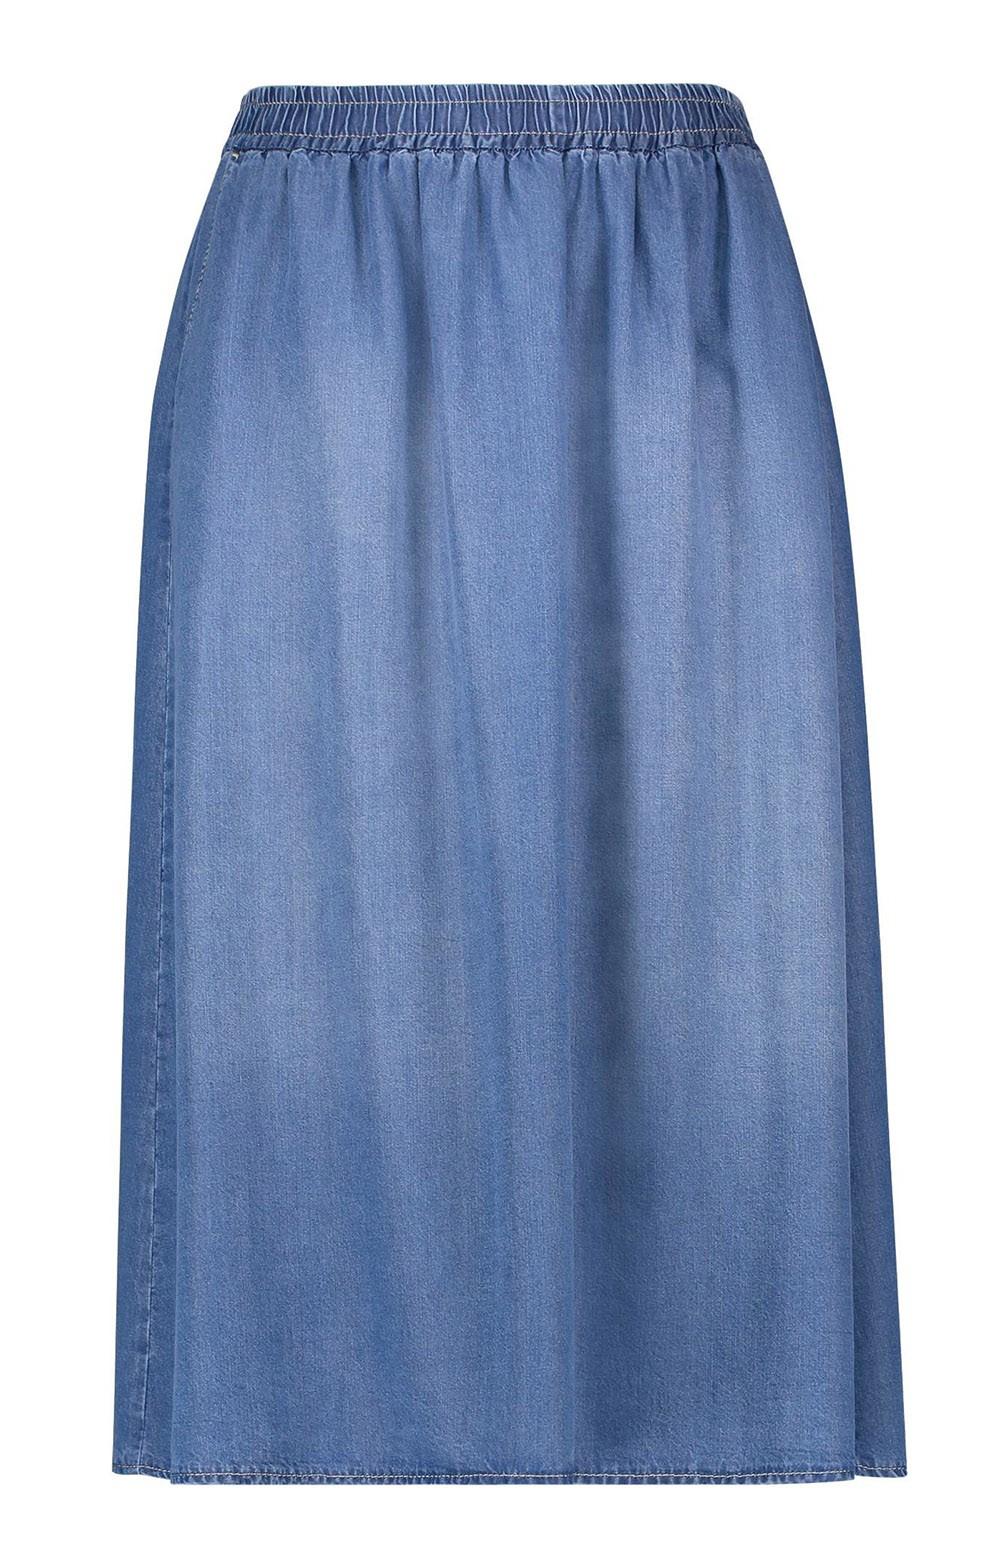 fcd84a1c10 Ladies Gerry Weber Tencel Denim Skirt - House of Bruar